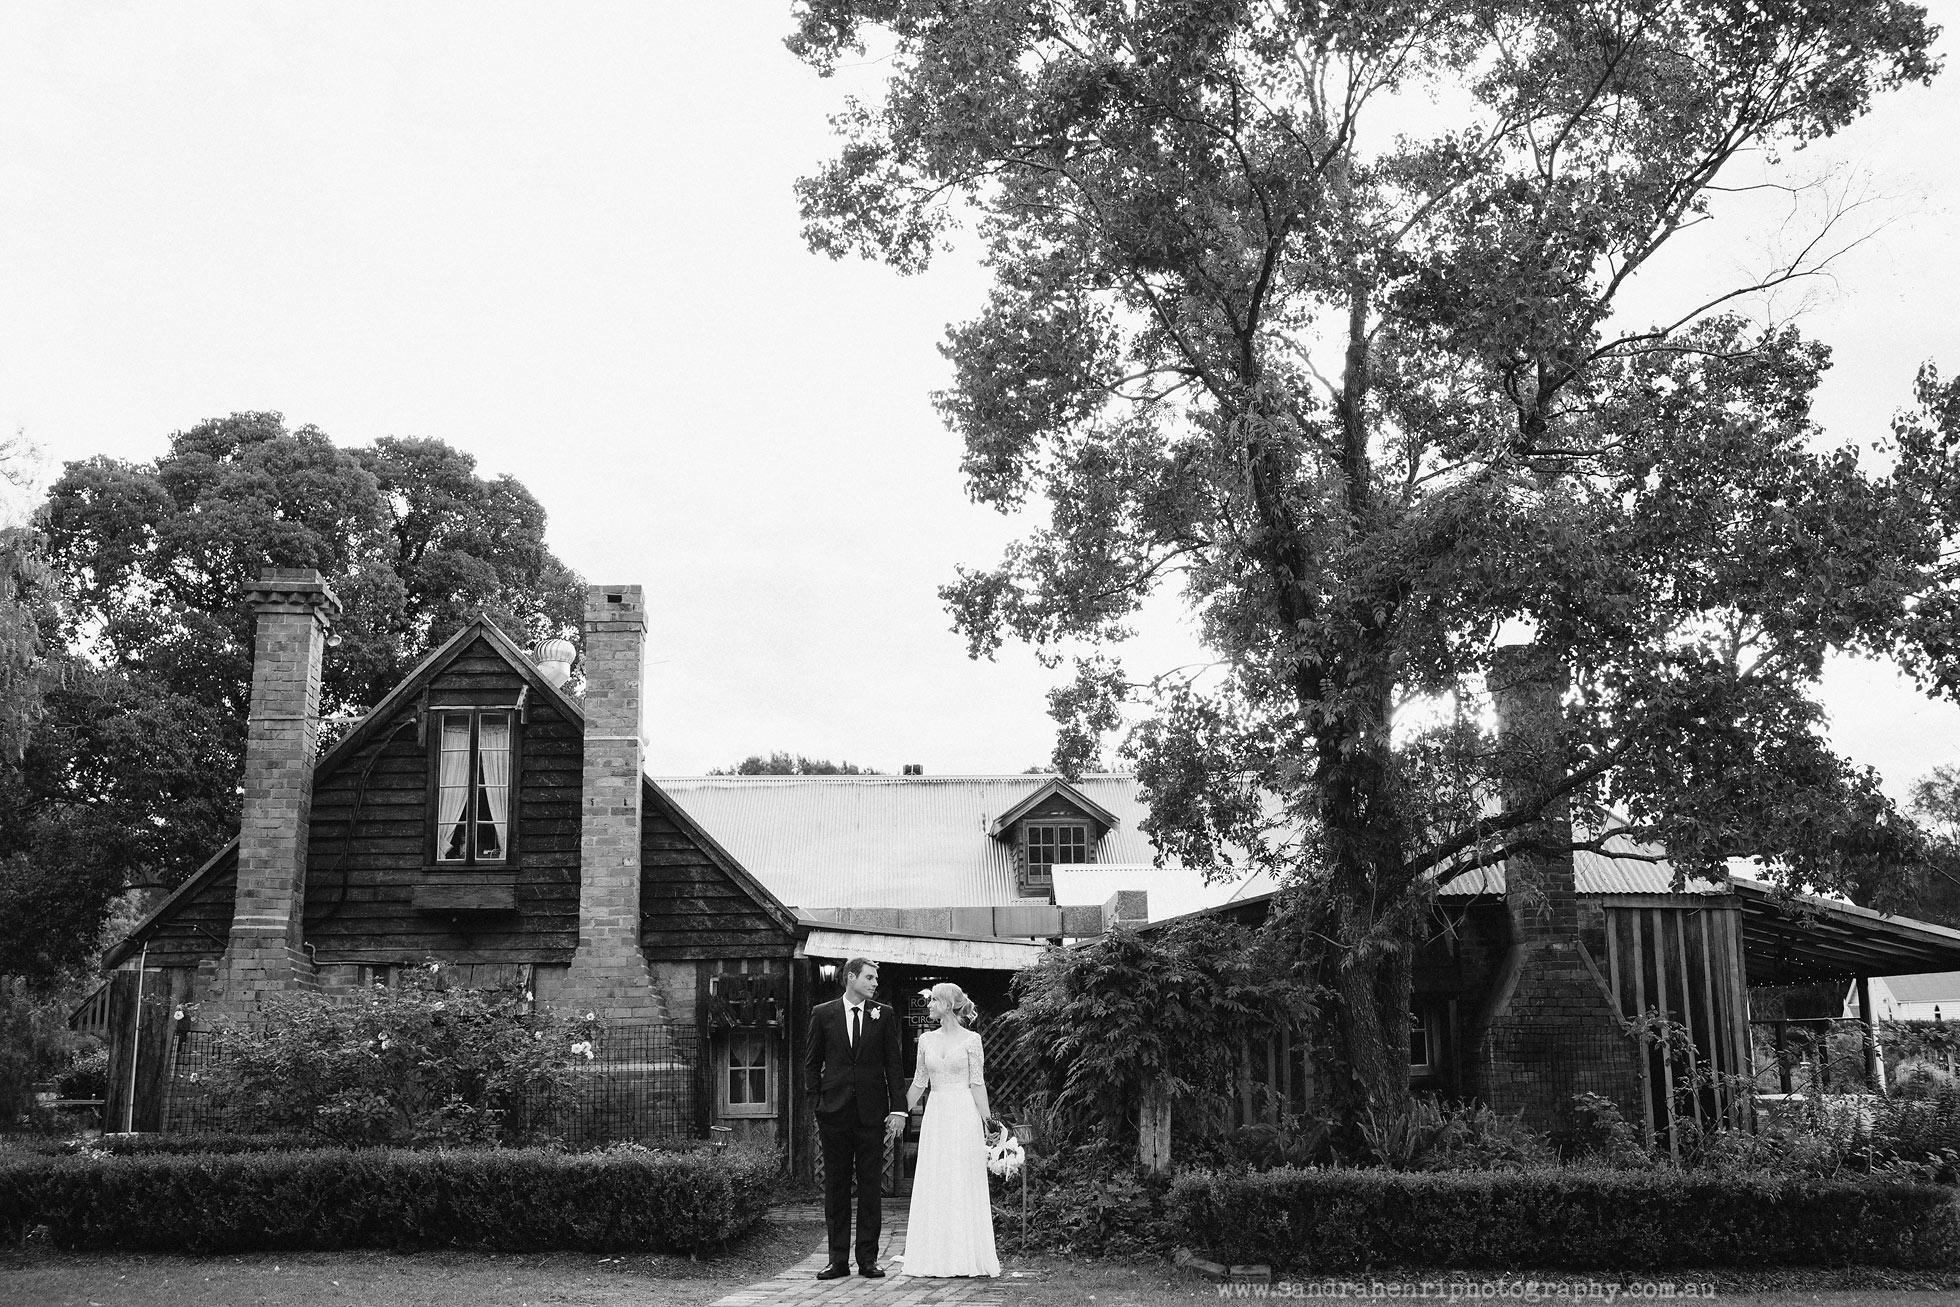 Roberts-Restaurant-garden-wedding-images-28.jpg